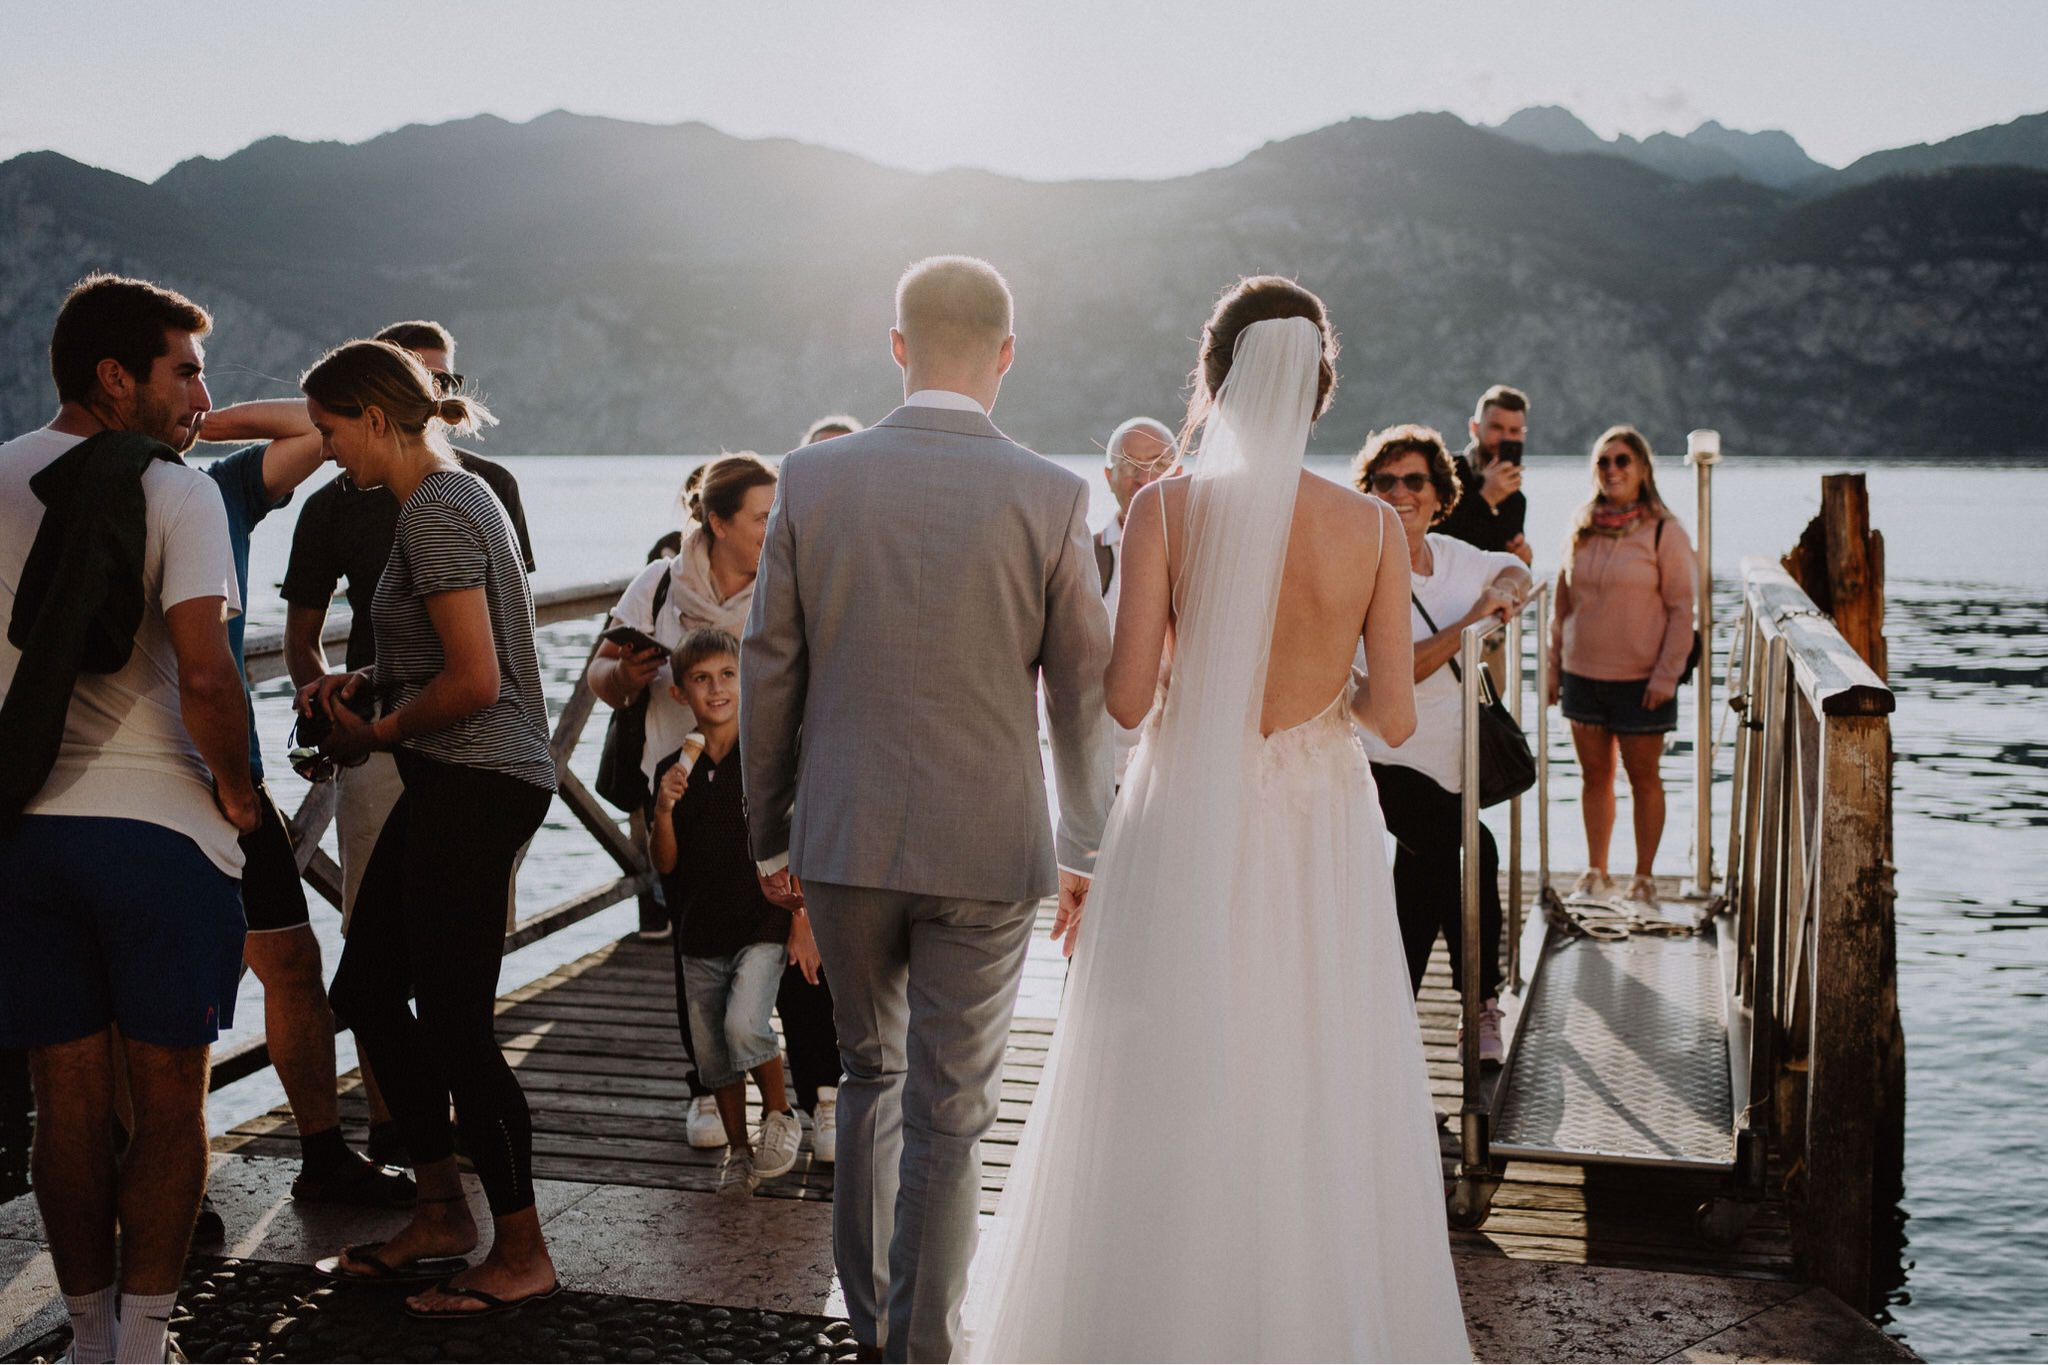 53 la 03 zeremonie 1329 weddinphotographer Hochzeitsfotograf newzealand hamilton Weddingphotography Stuttgart